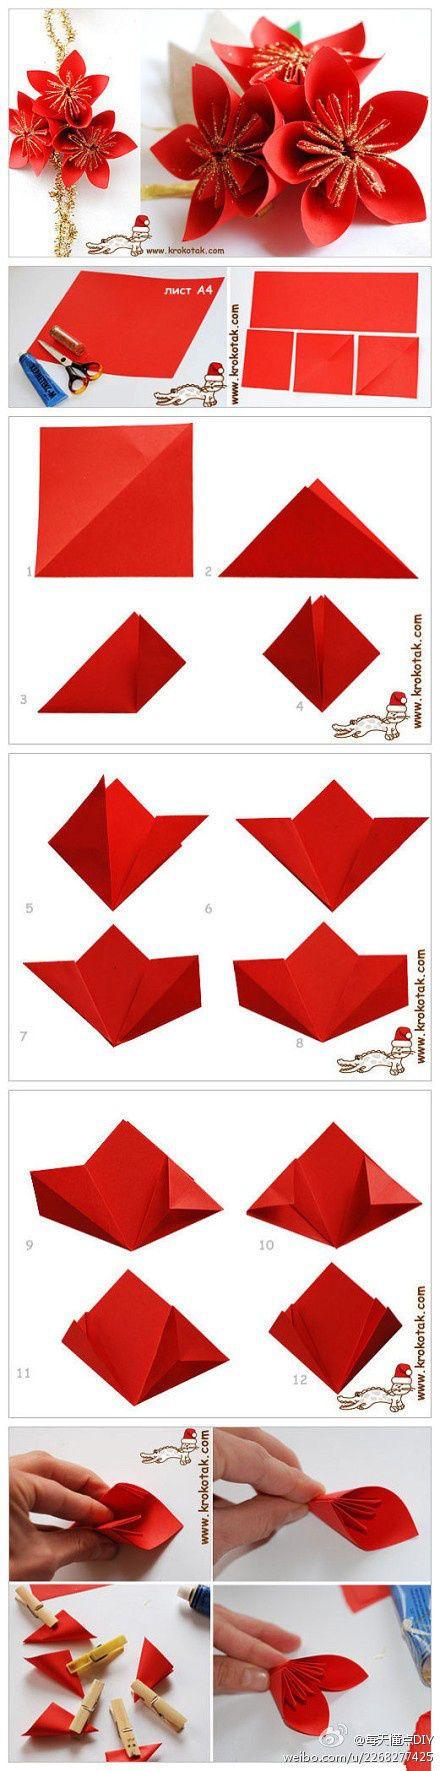 Fiori decorazione diy pinterest poinsettia origami and flowers origami poinsettia christmas diy ideas craft flowers paper crafts origami christmas crafts christmas decorations christmas decor christmas crafts for kids mightylinksfo